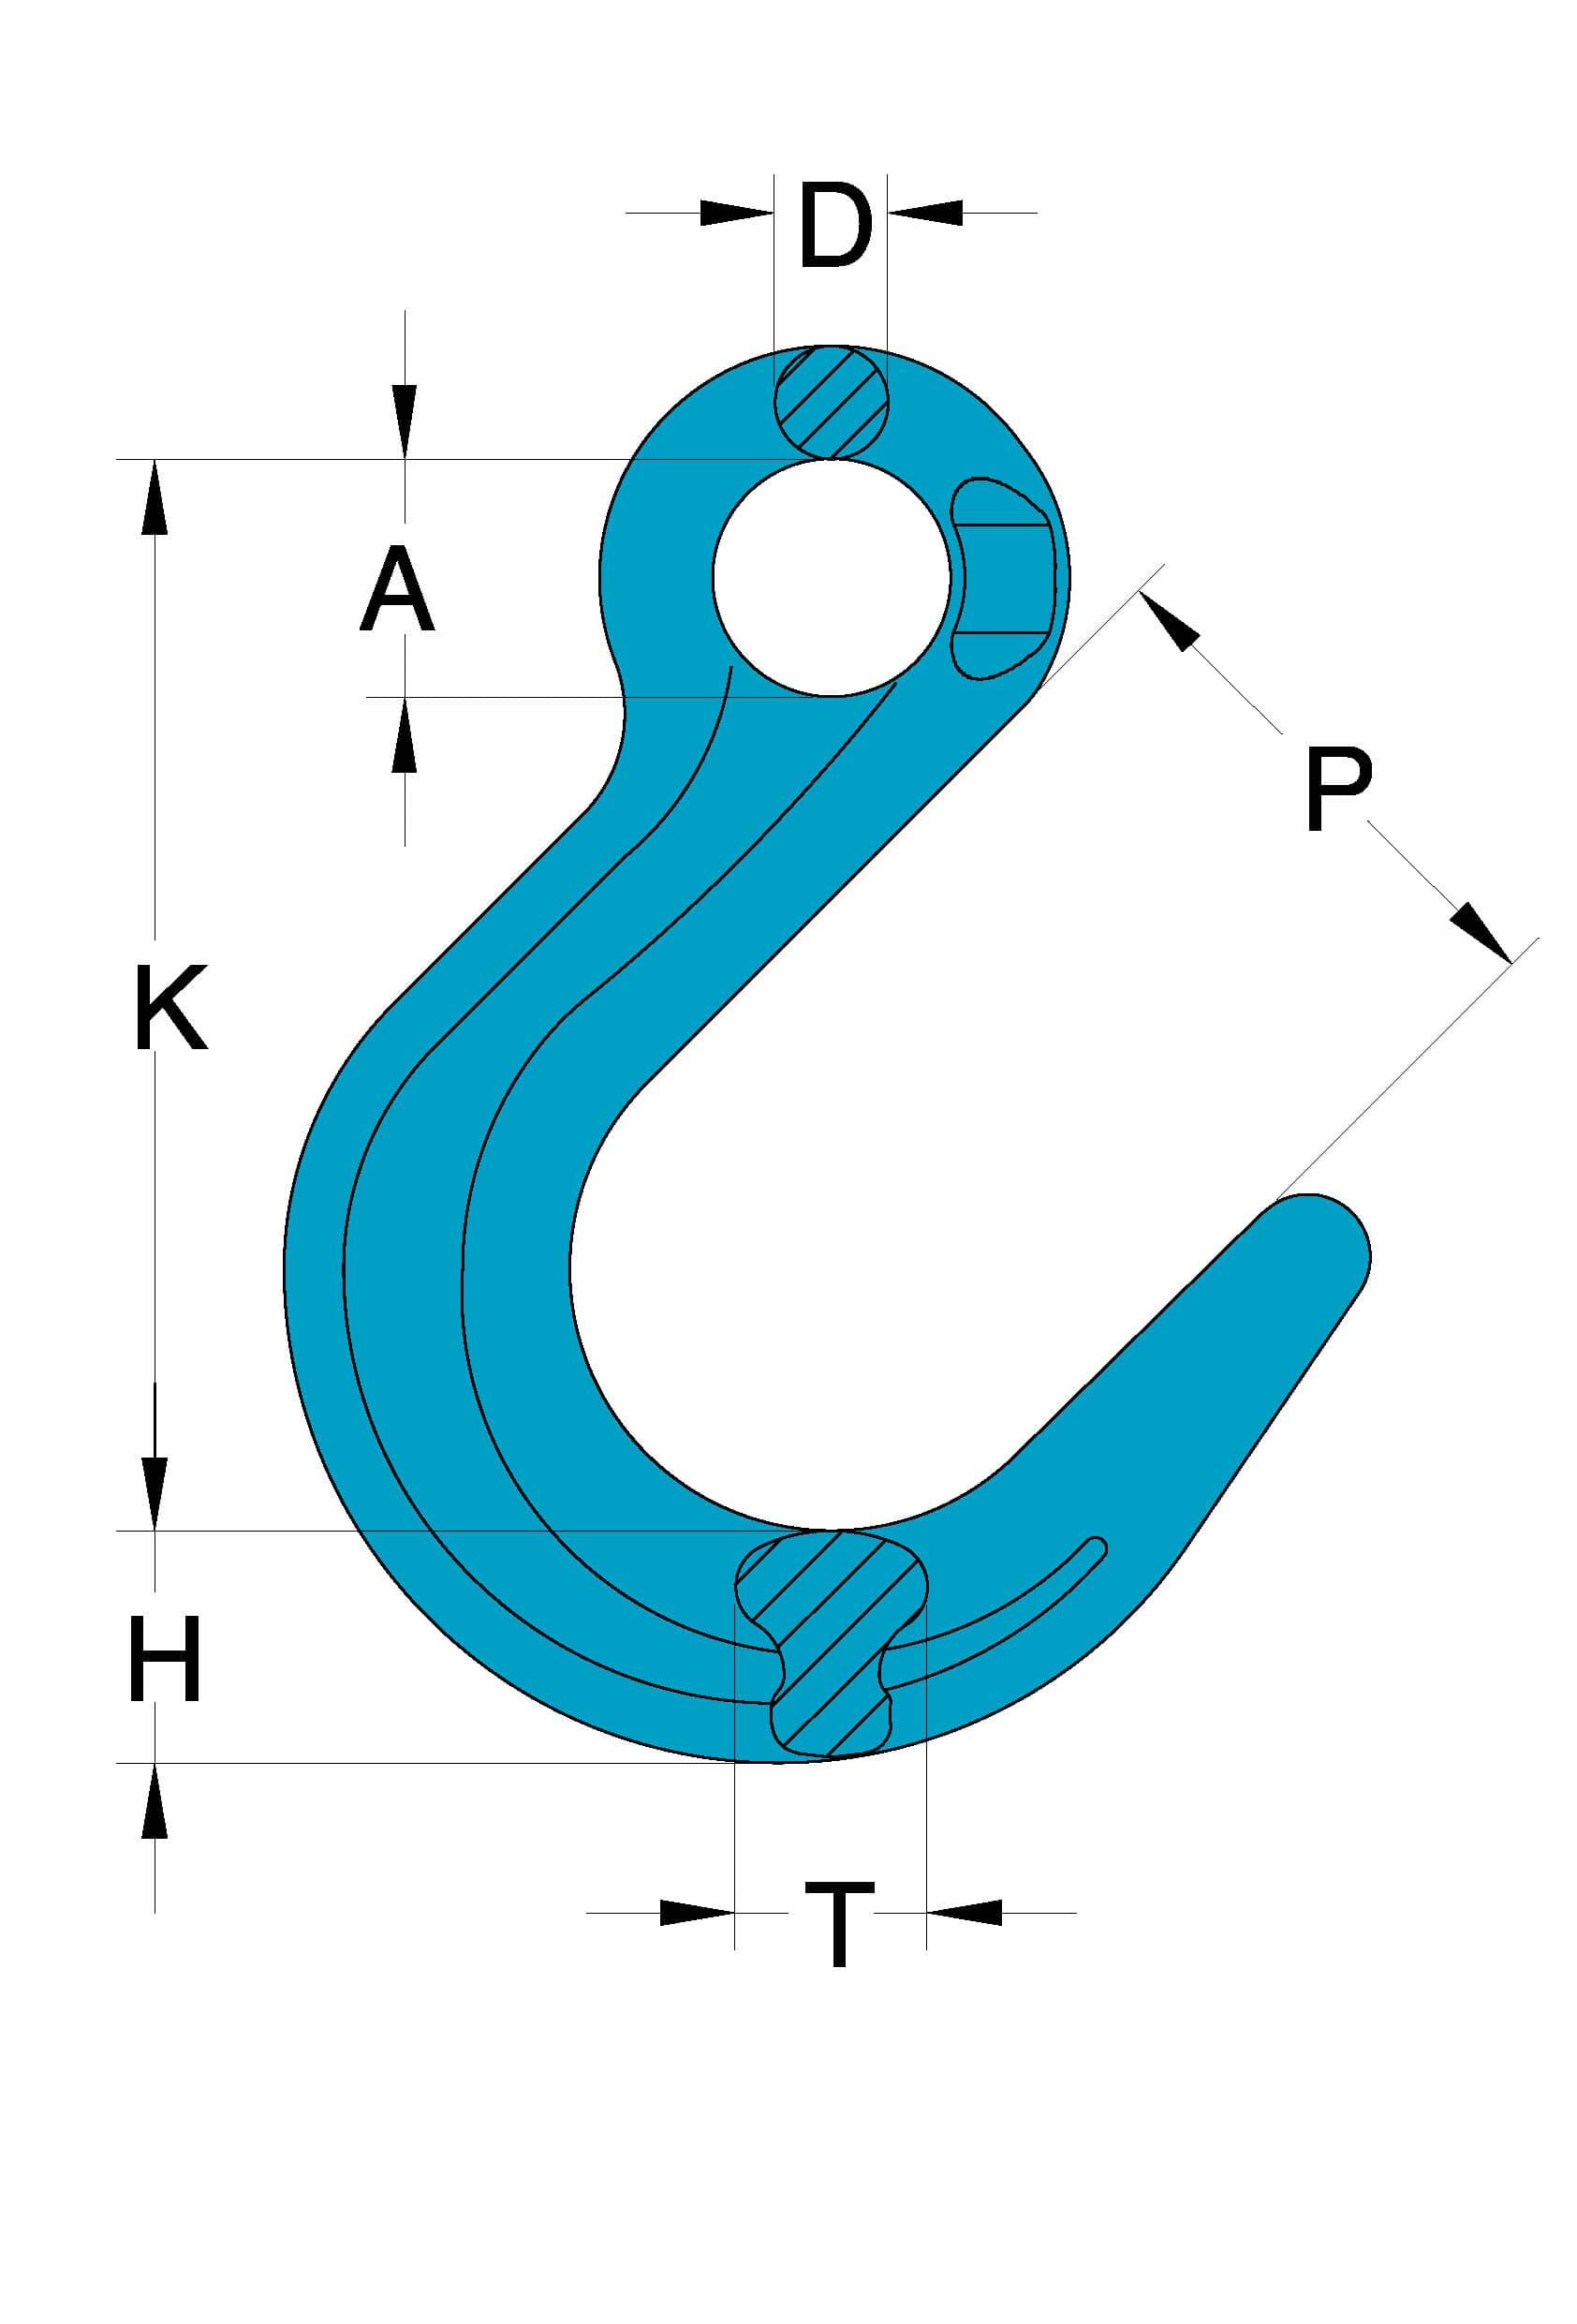 Grade 100 Chain Fittings Eye Foundry Hook_drawing-min